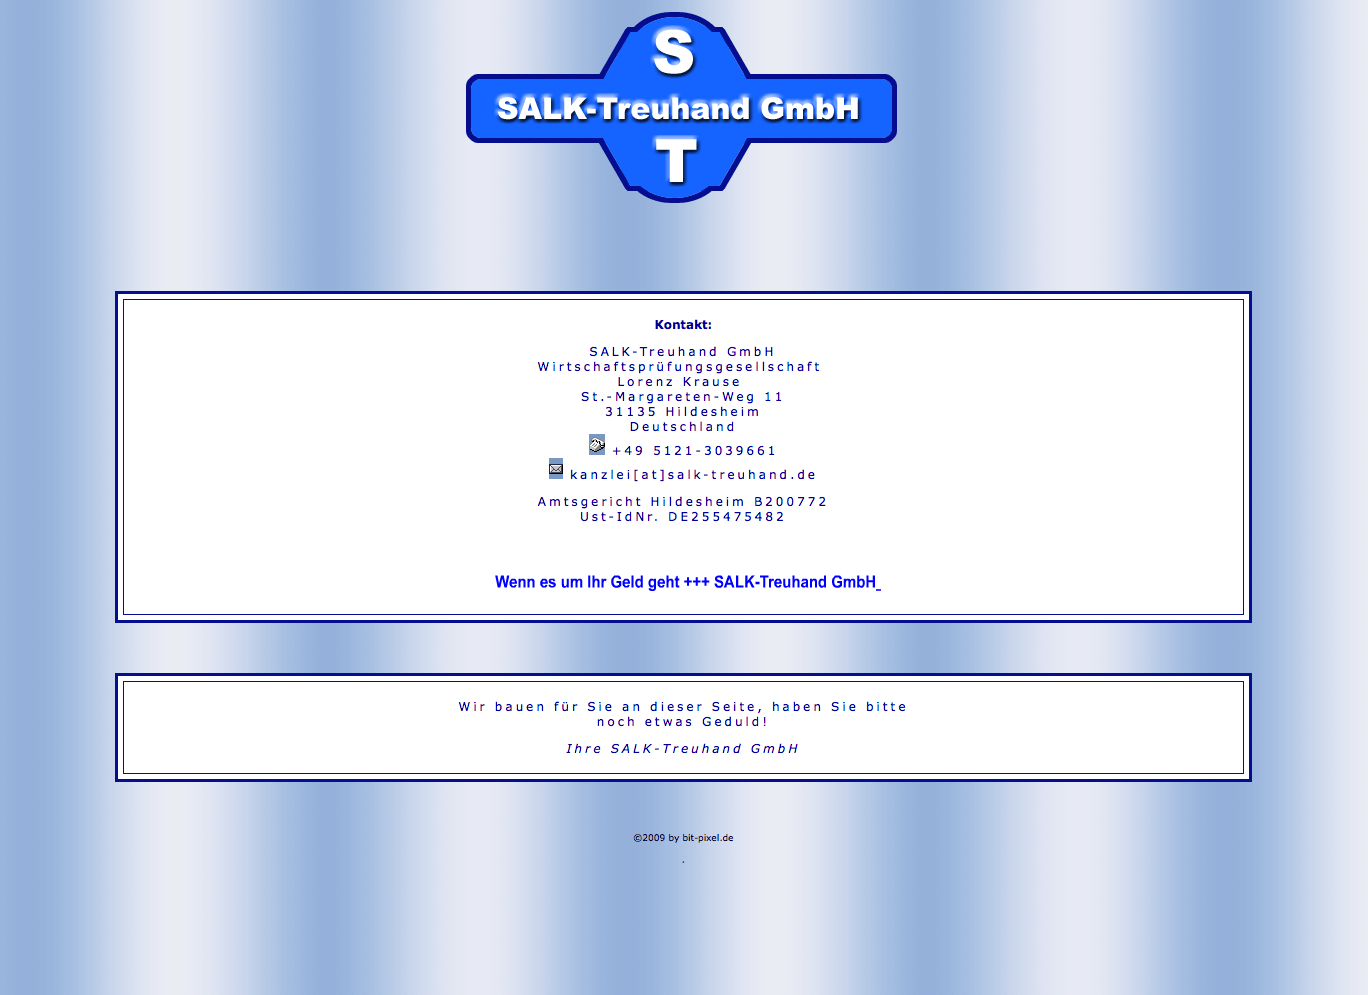 SALK Treuhand GmbH - Lorenz Krause